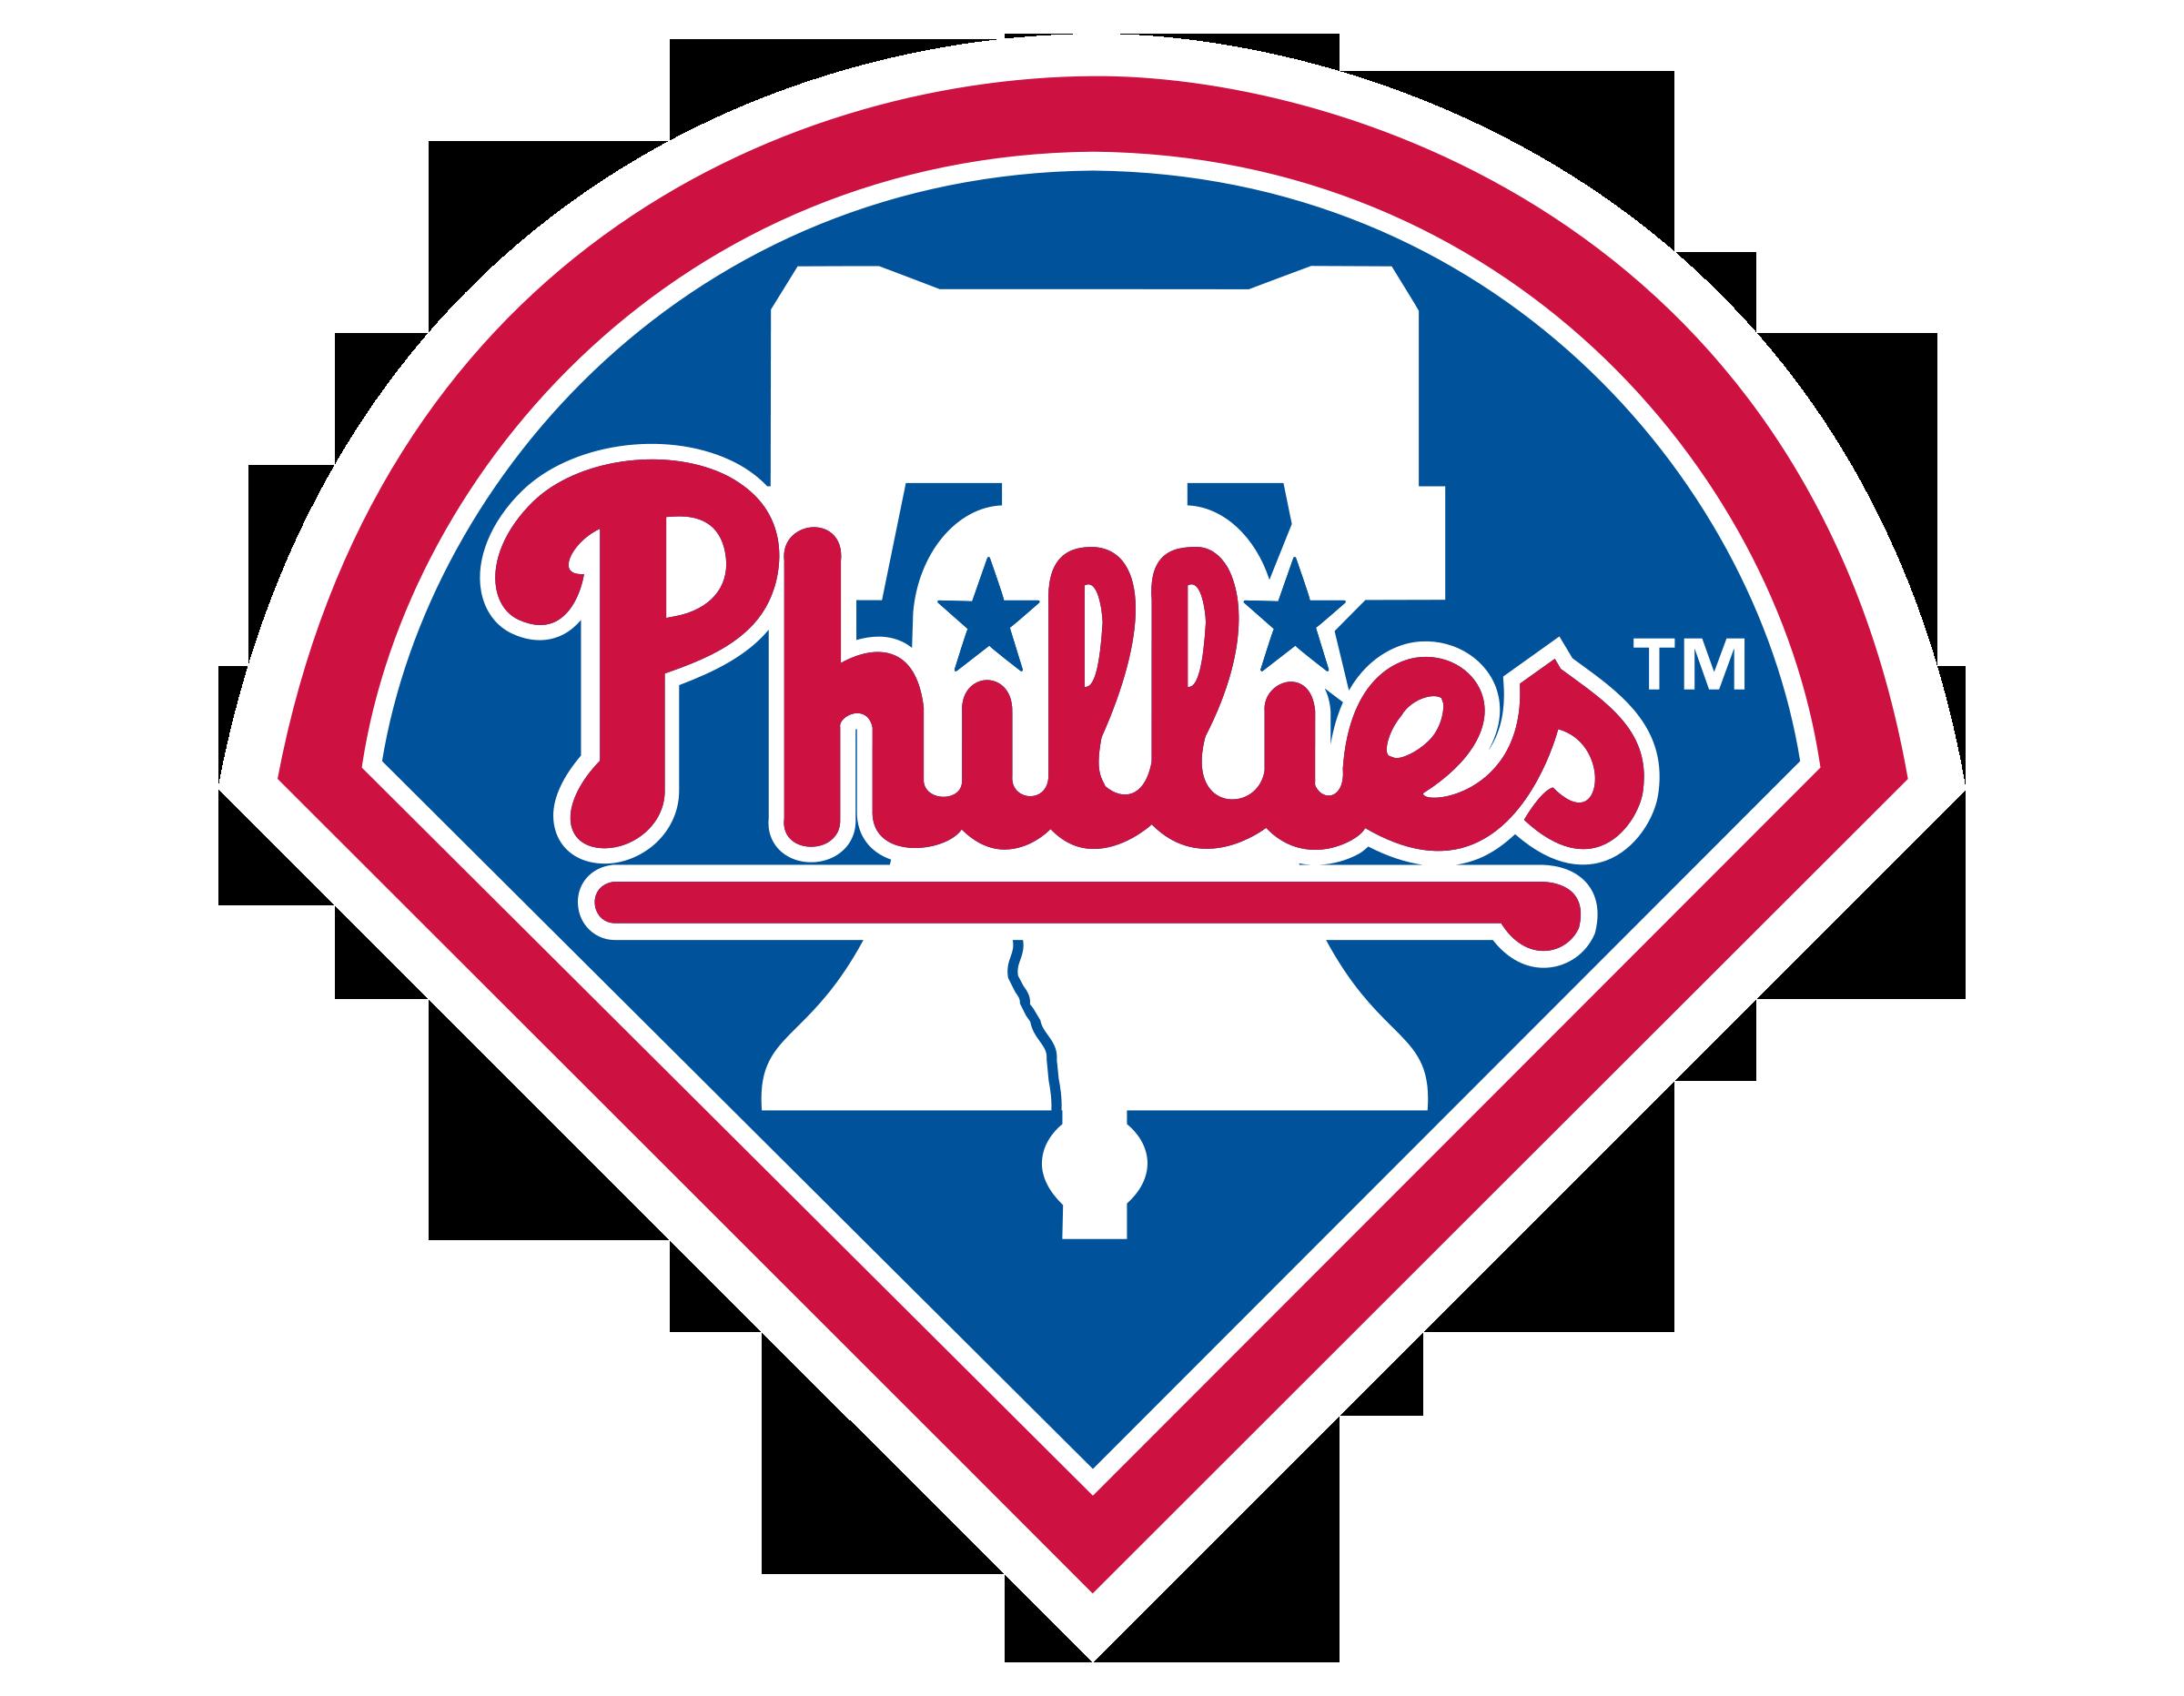 Meaning Philadelphia Phillies Logo And Symbol History And Evolution Philadelphia Phillies Baseball Philadelphia Phillies Logo Phillies Baseball